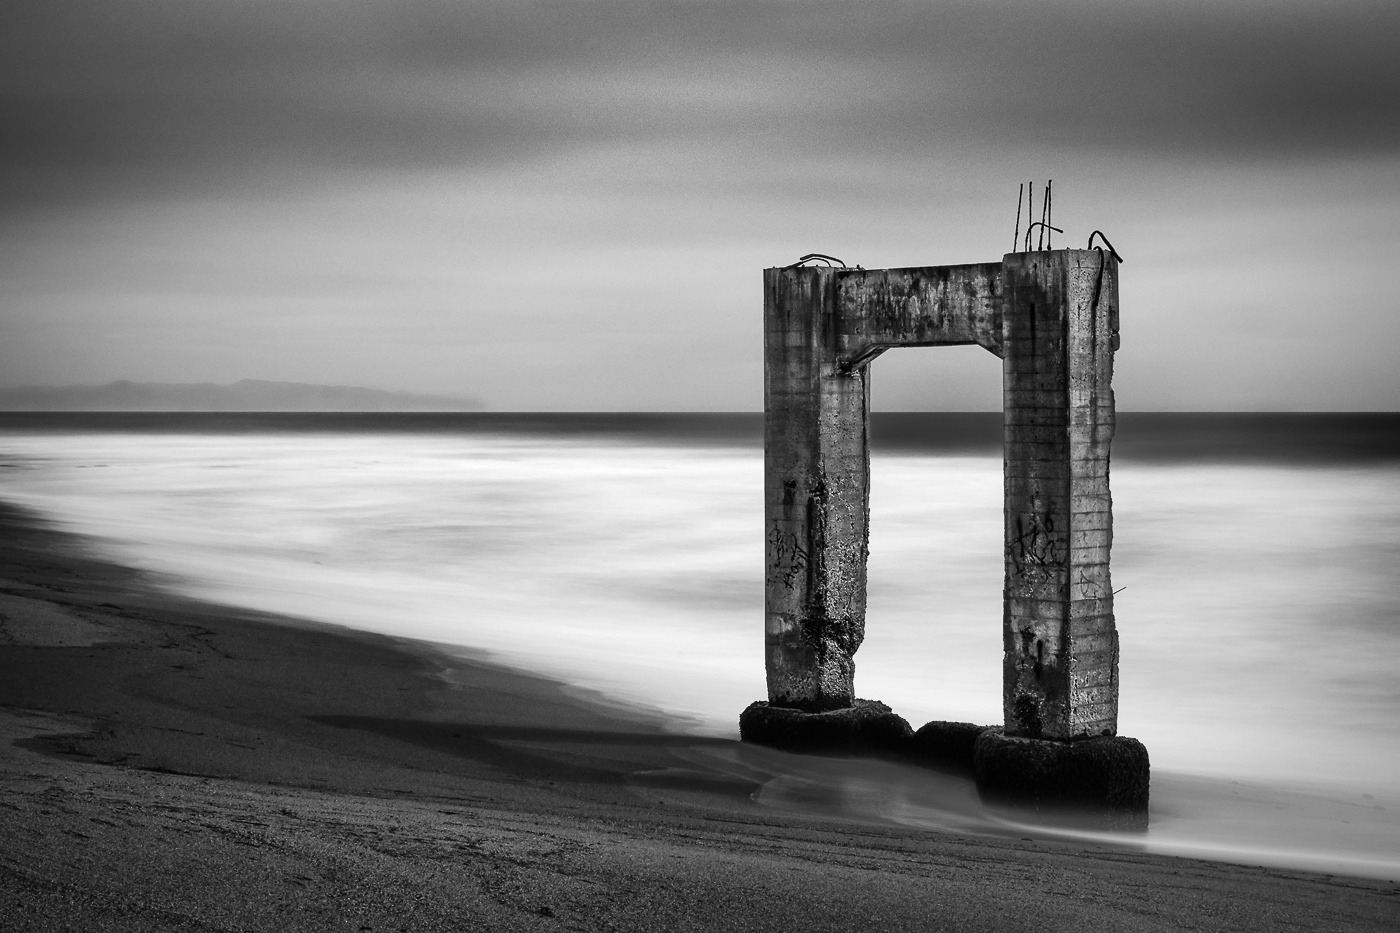 Pacific Portal. Abandoned pier  - stefanbaeurle | ello